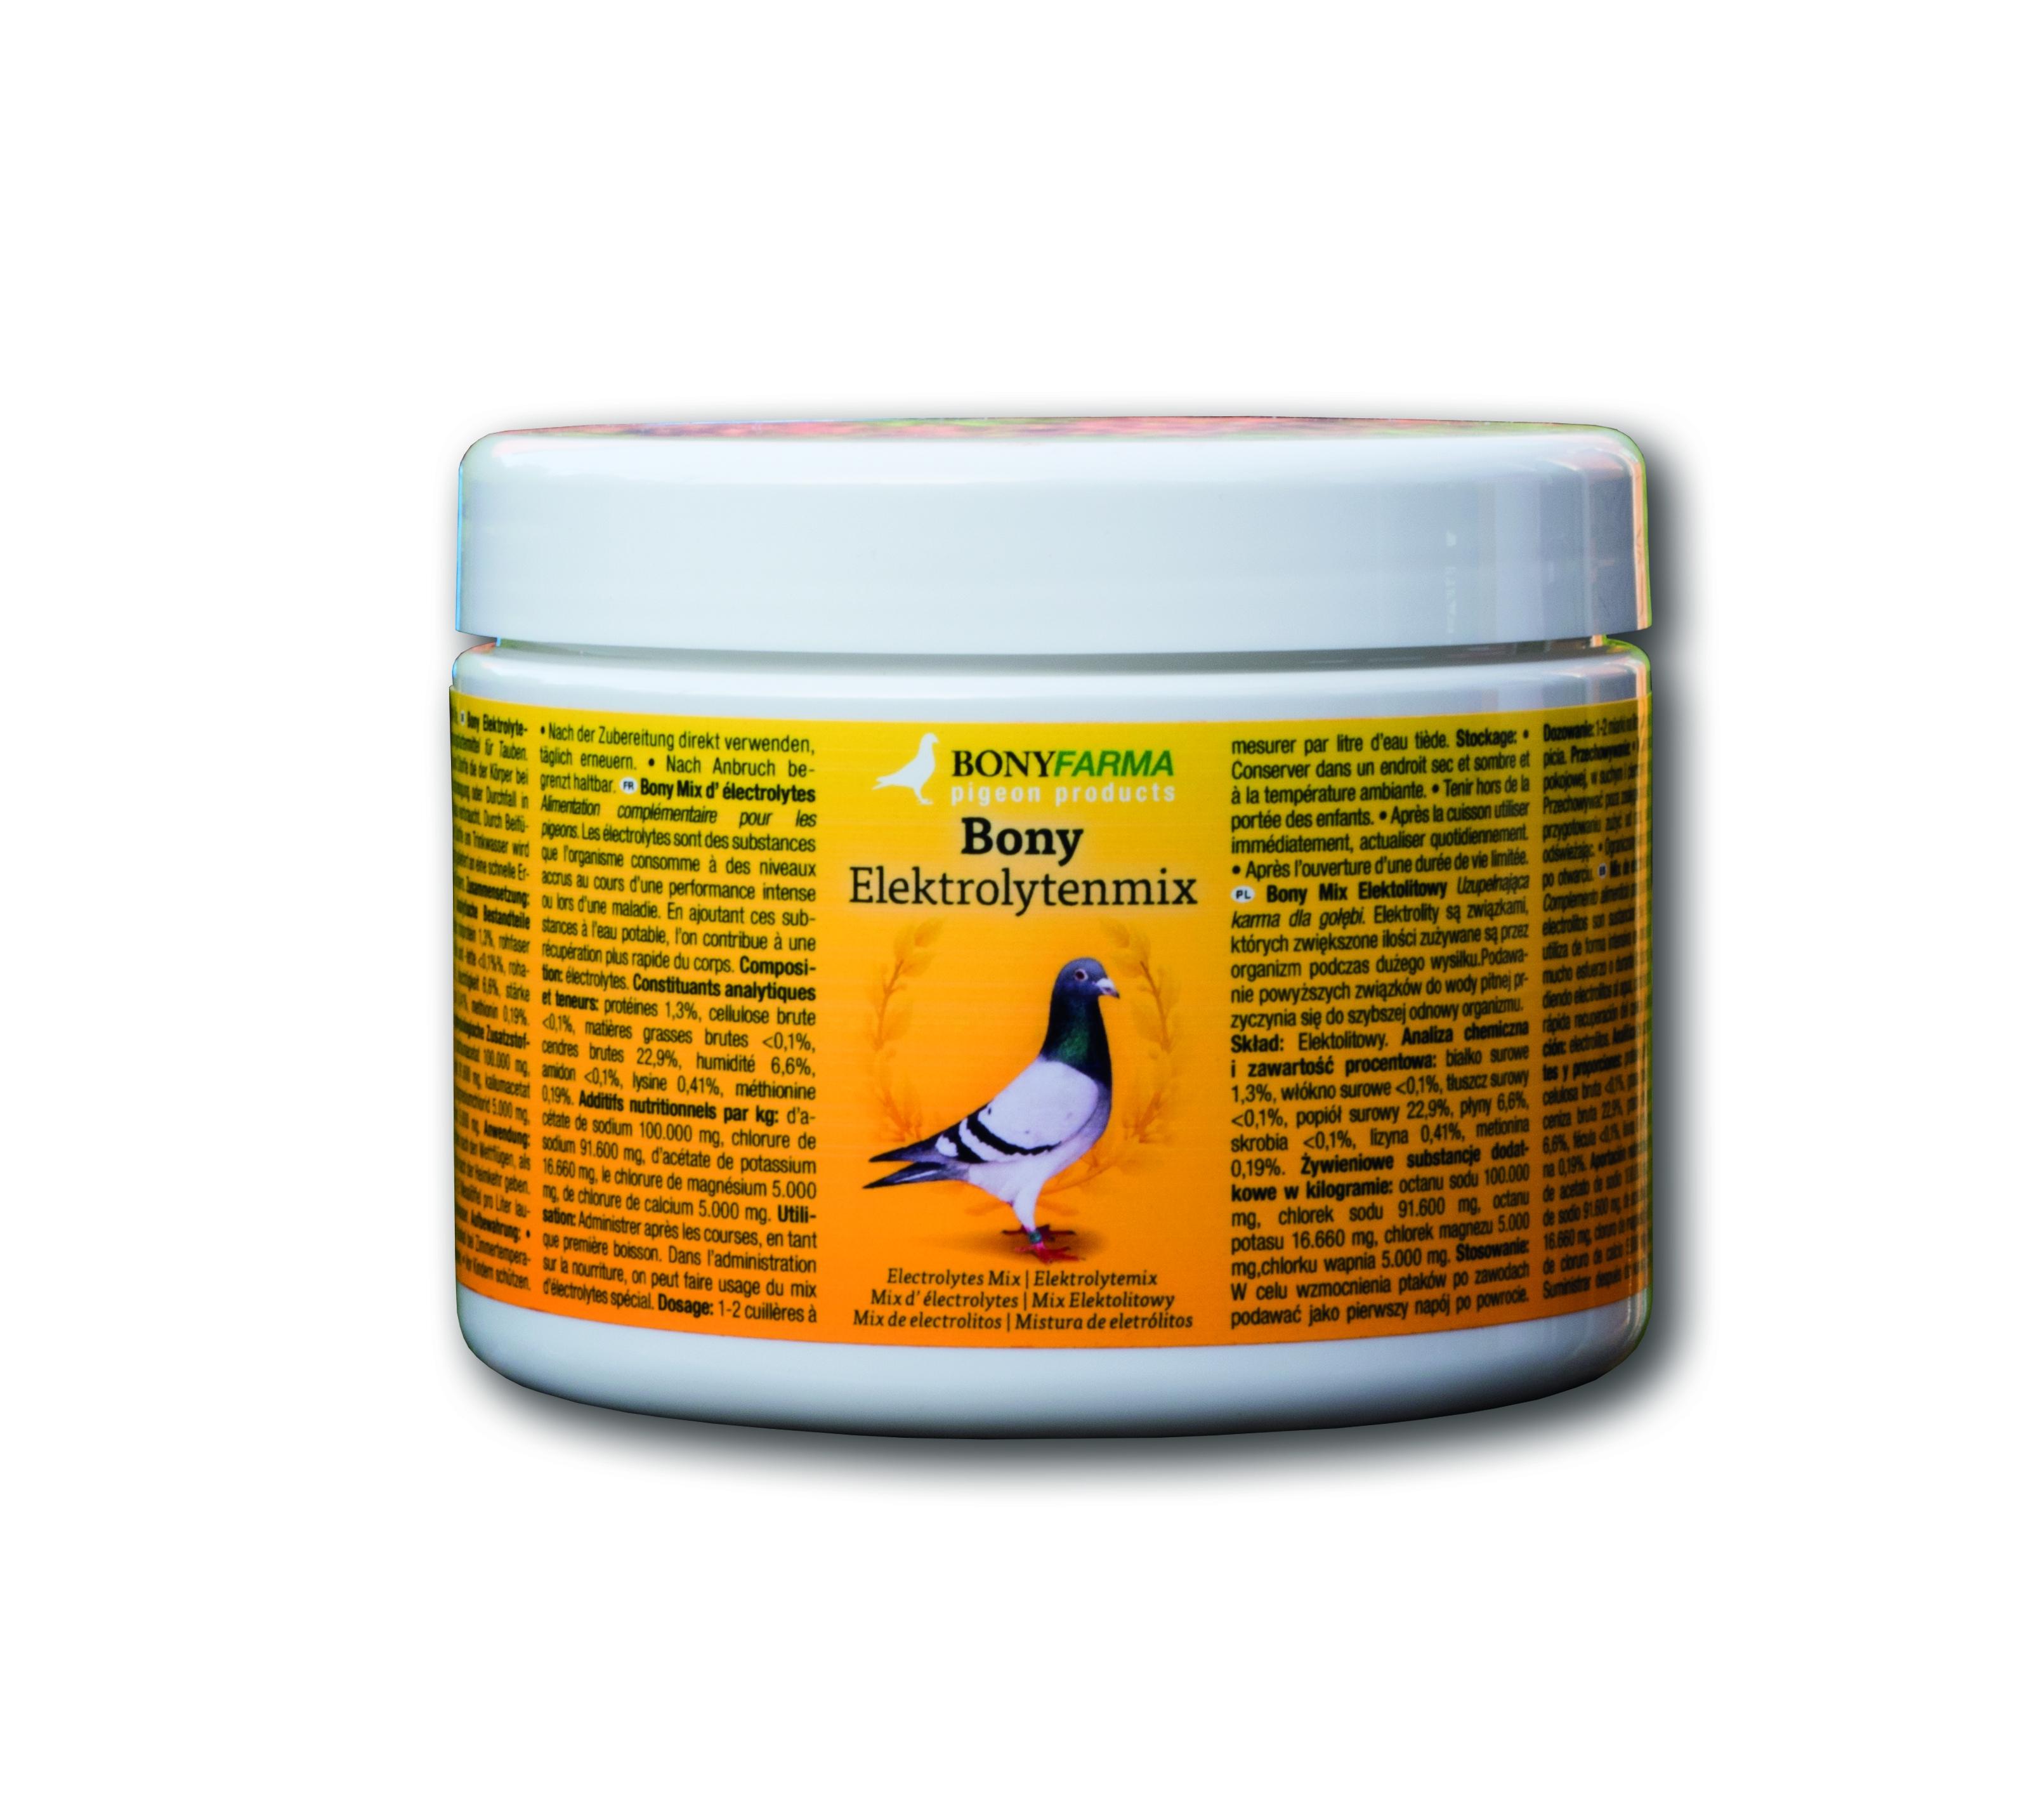 Bony Elektrolytenmix (350 gr.)